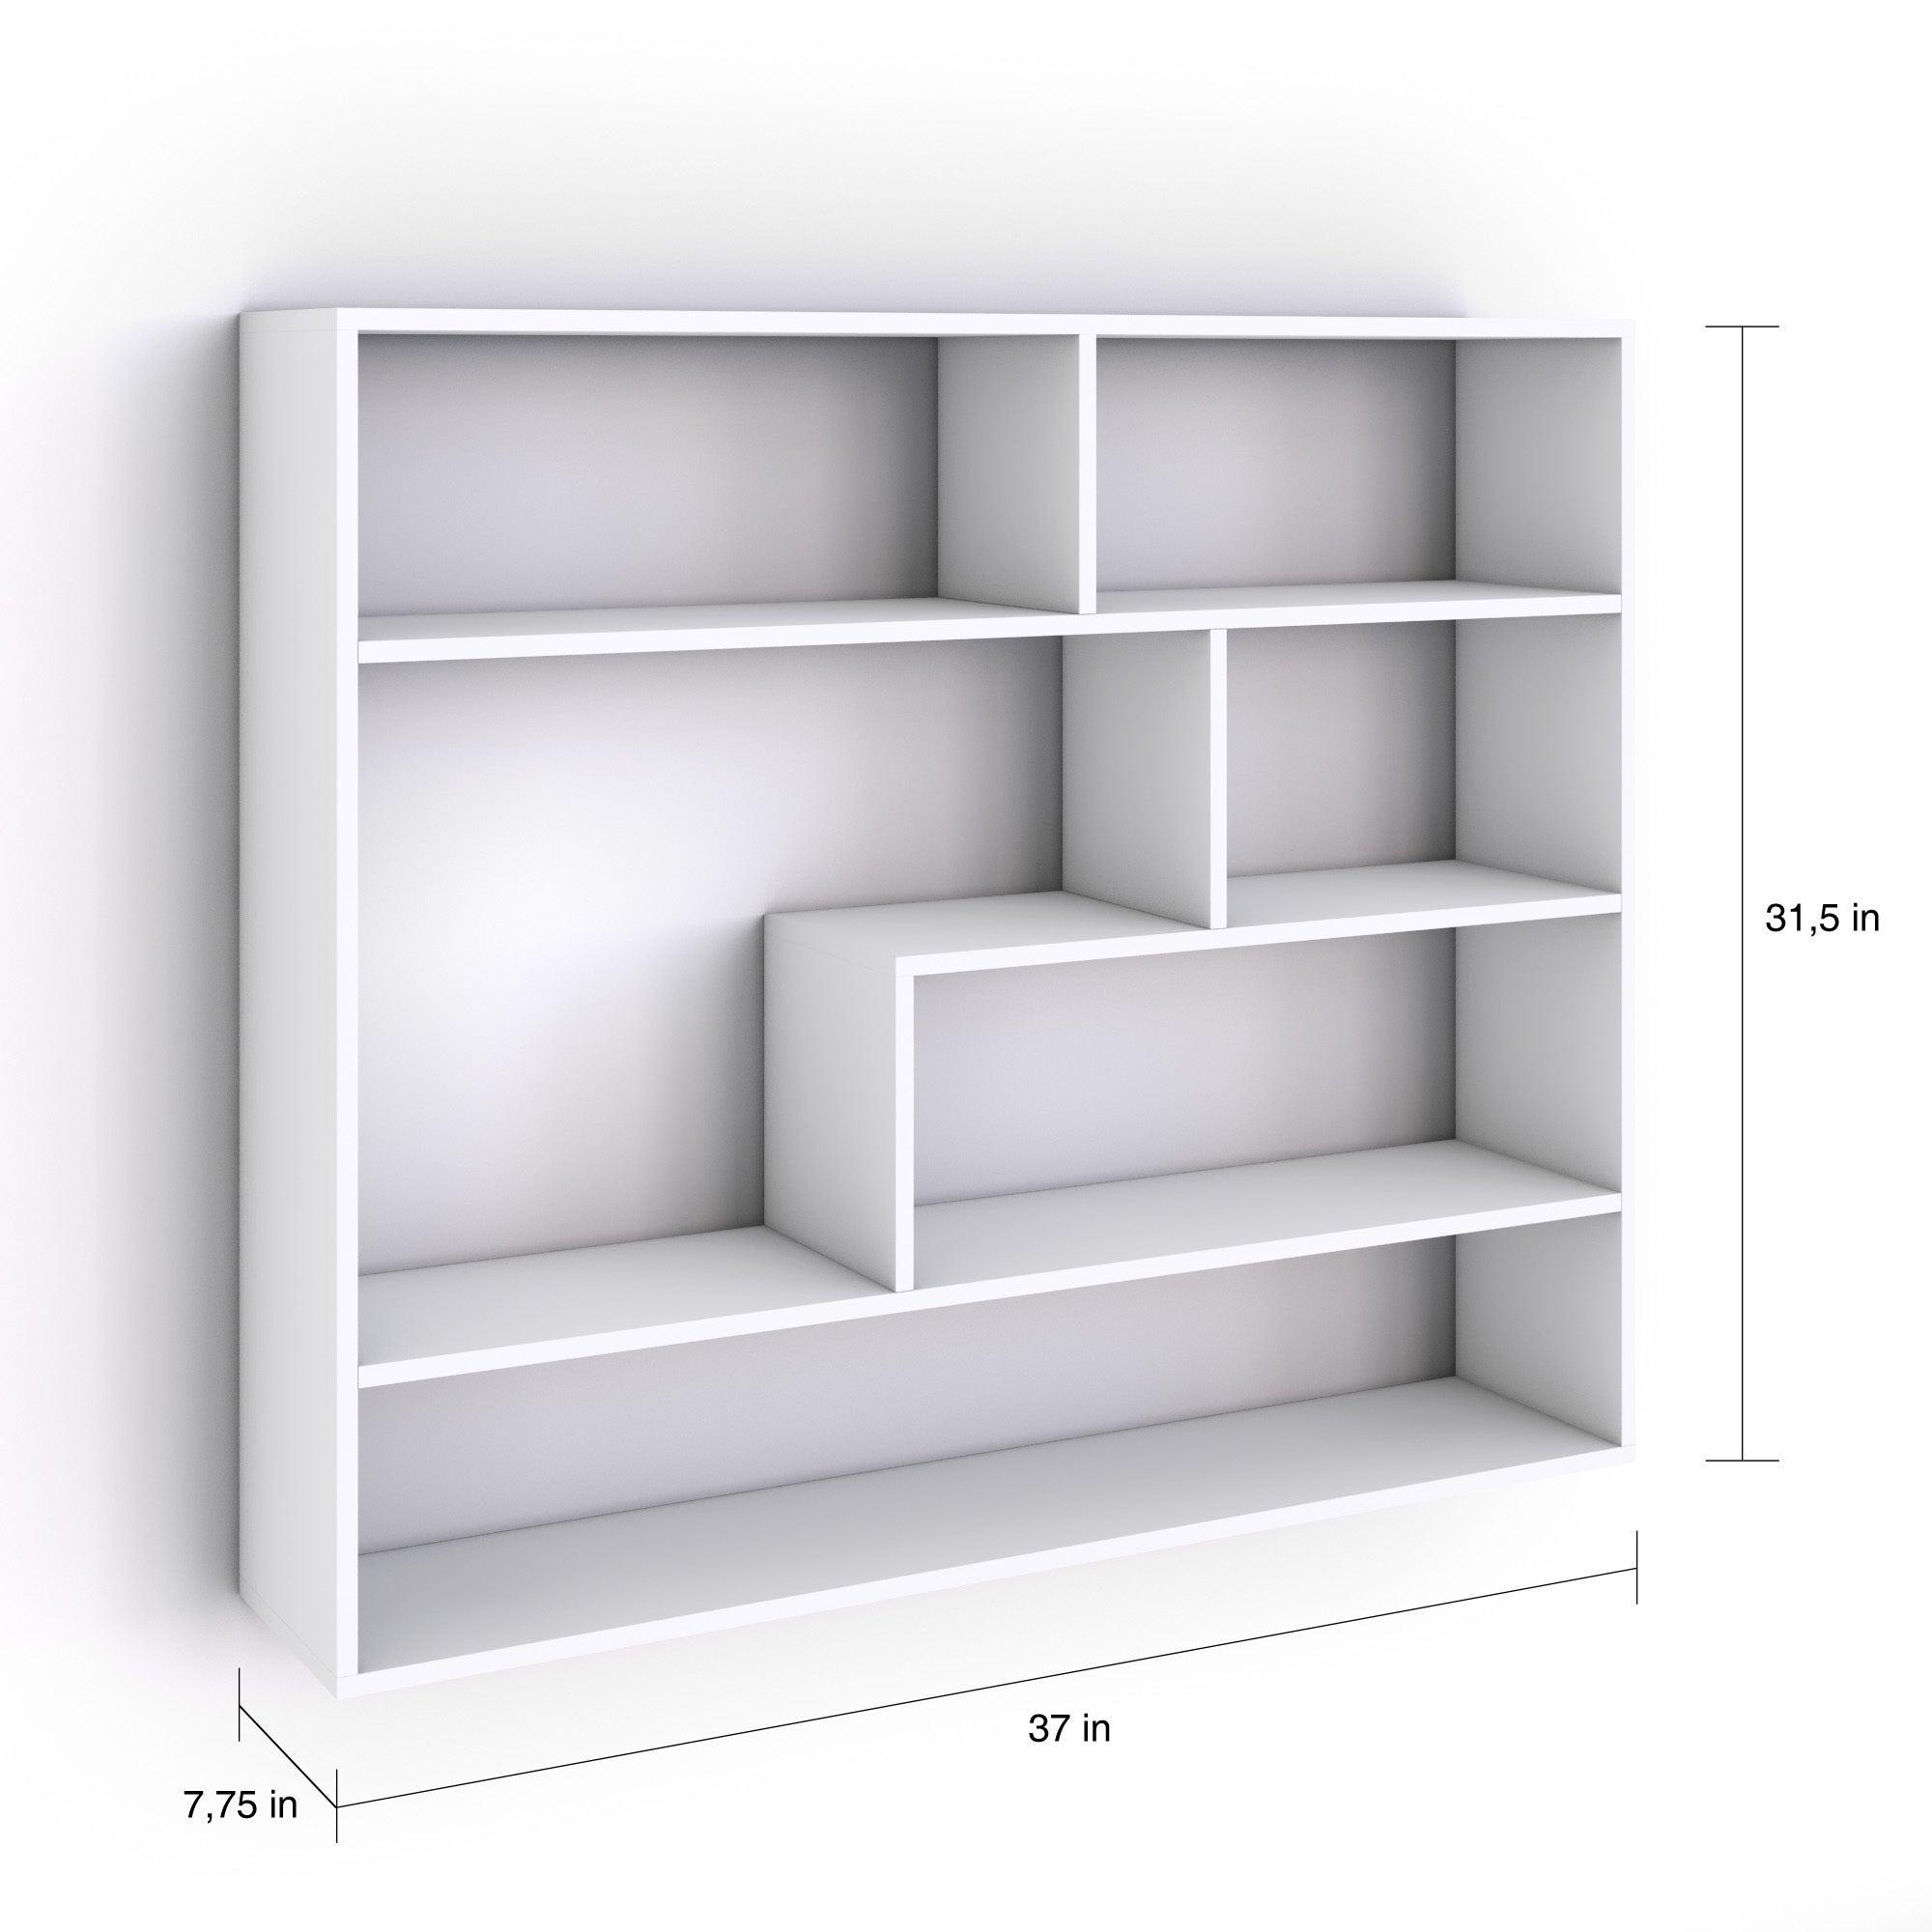 care now habitat buy instructions at white uk gloss high kubrik shelving shelf short unit